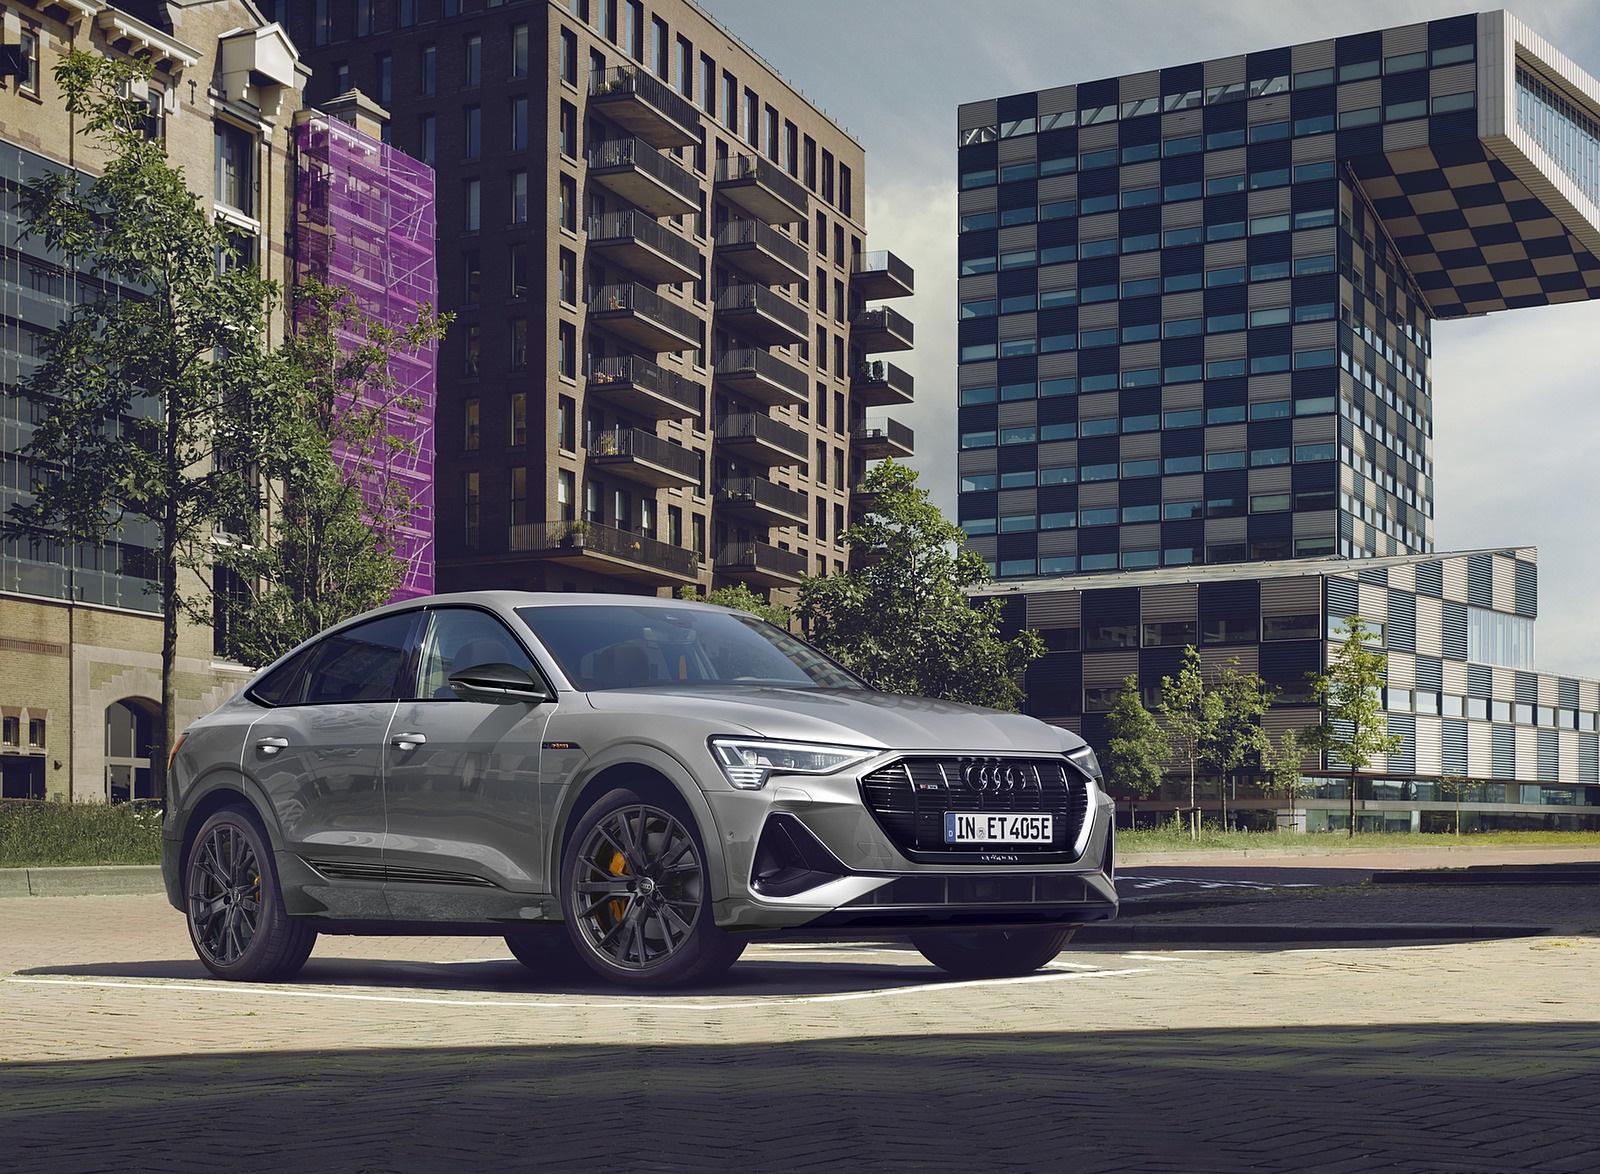 2022 Audi e-tron Sportback S Line Black Edition (Color: Chronos Grey Metallic) Front Three-Quarter Wallpapers (3)